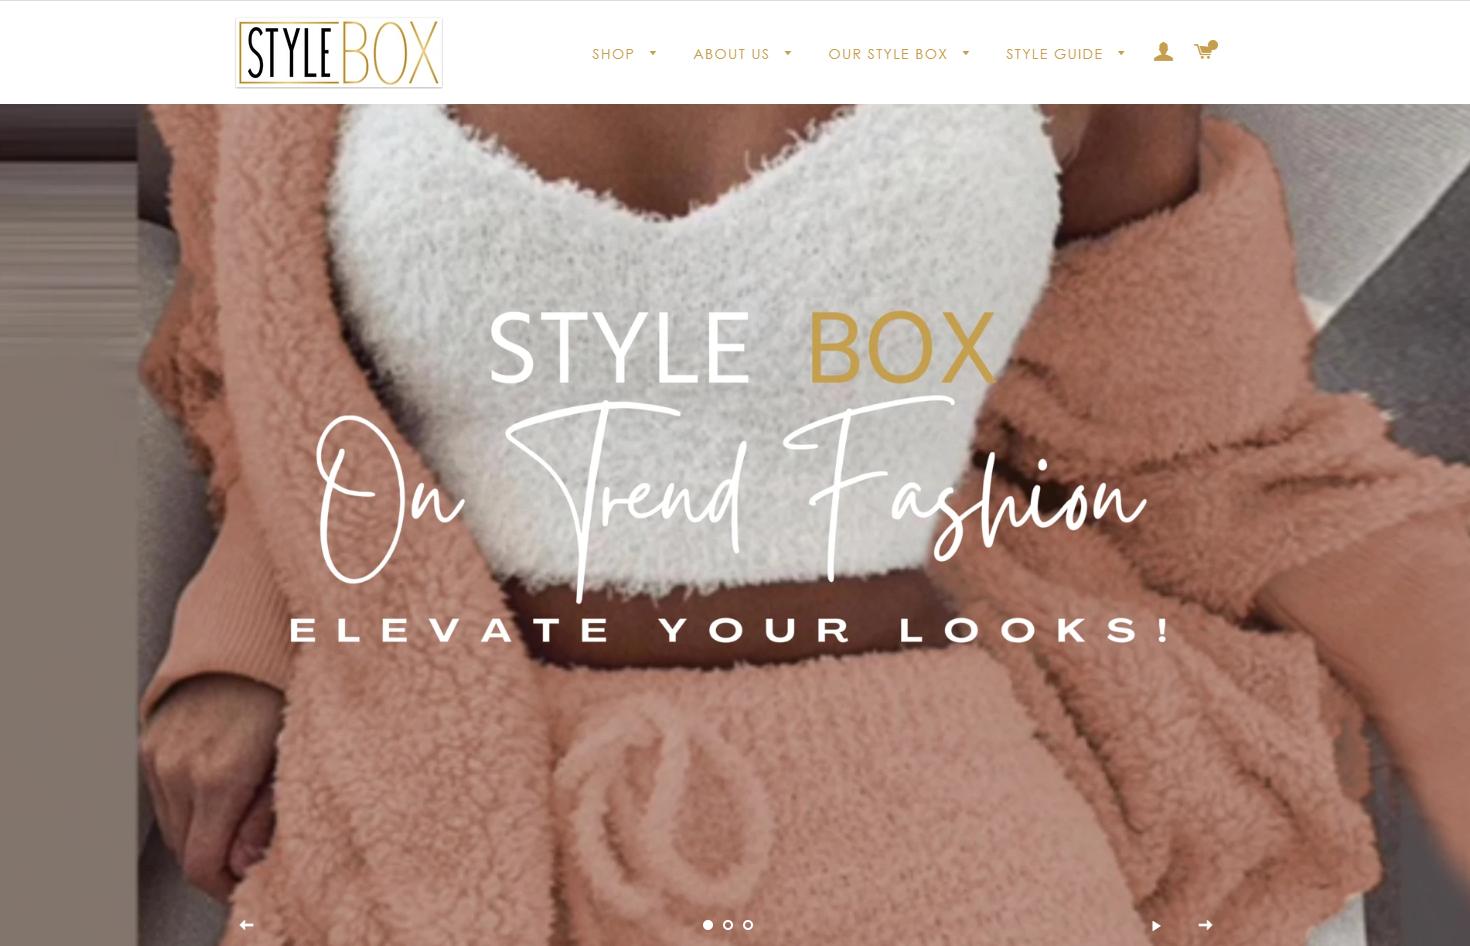 Style Box Website Homepage